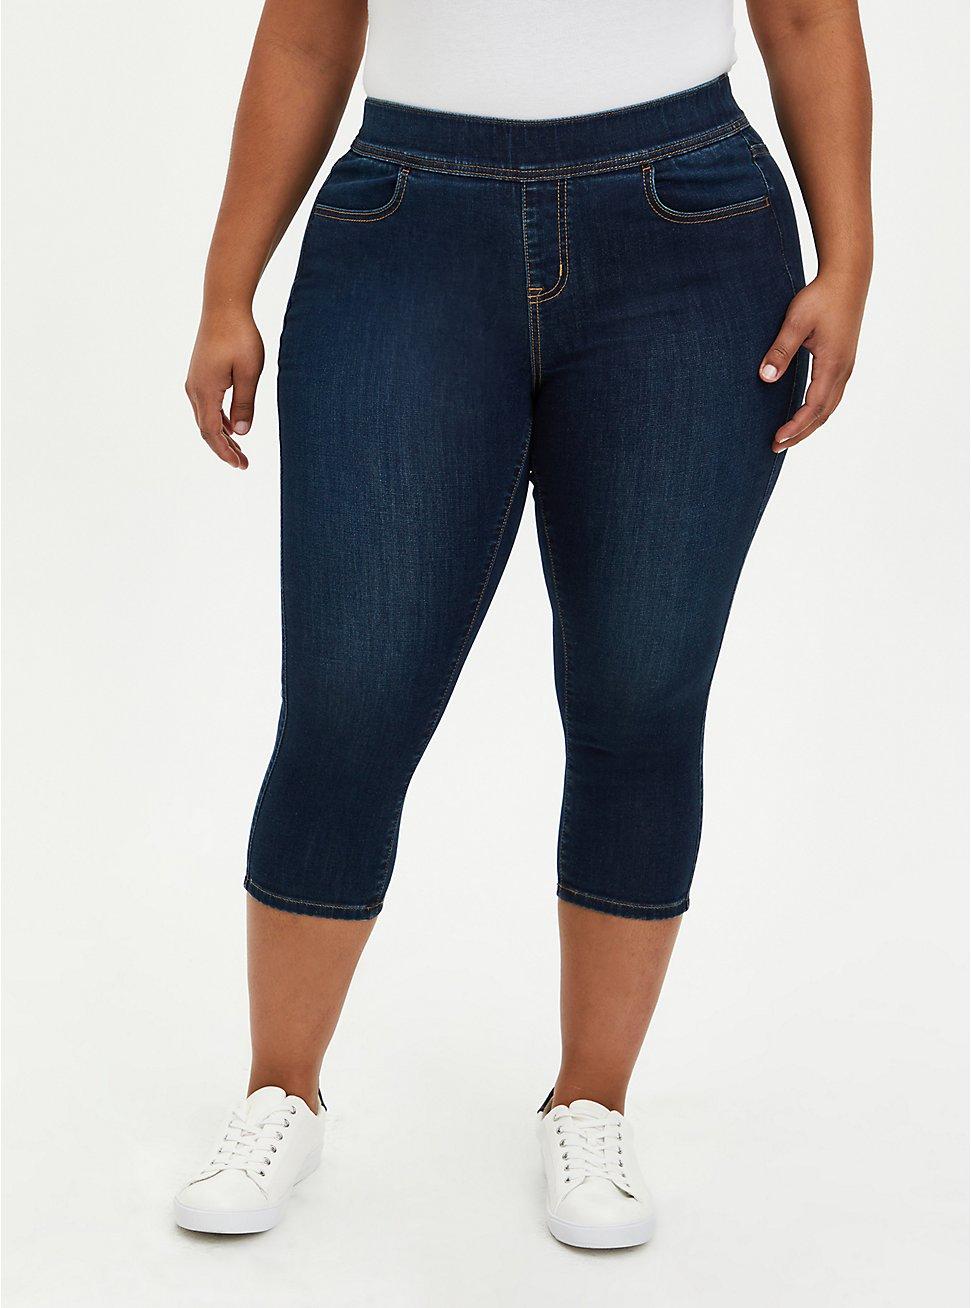 Crop Lean Jean - Super Soft Dark Wash, BASIN, hi-res